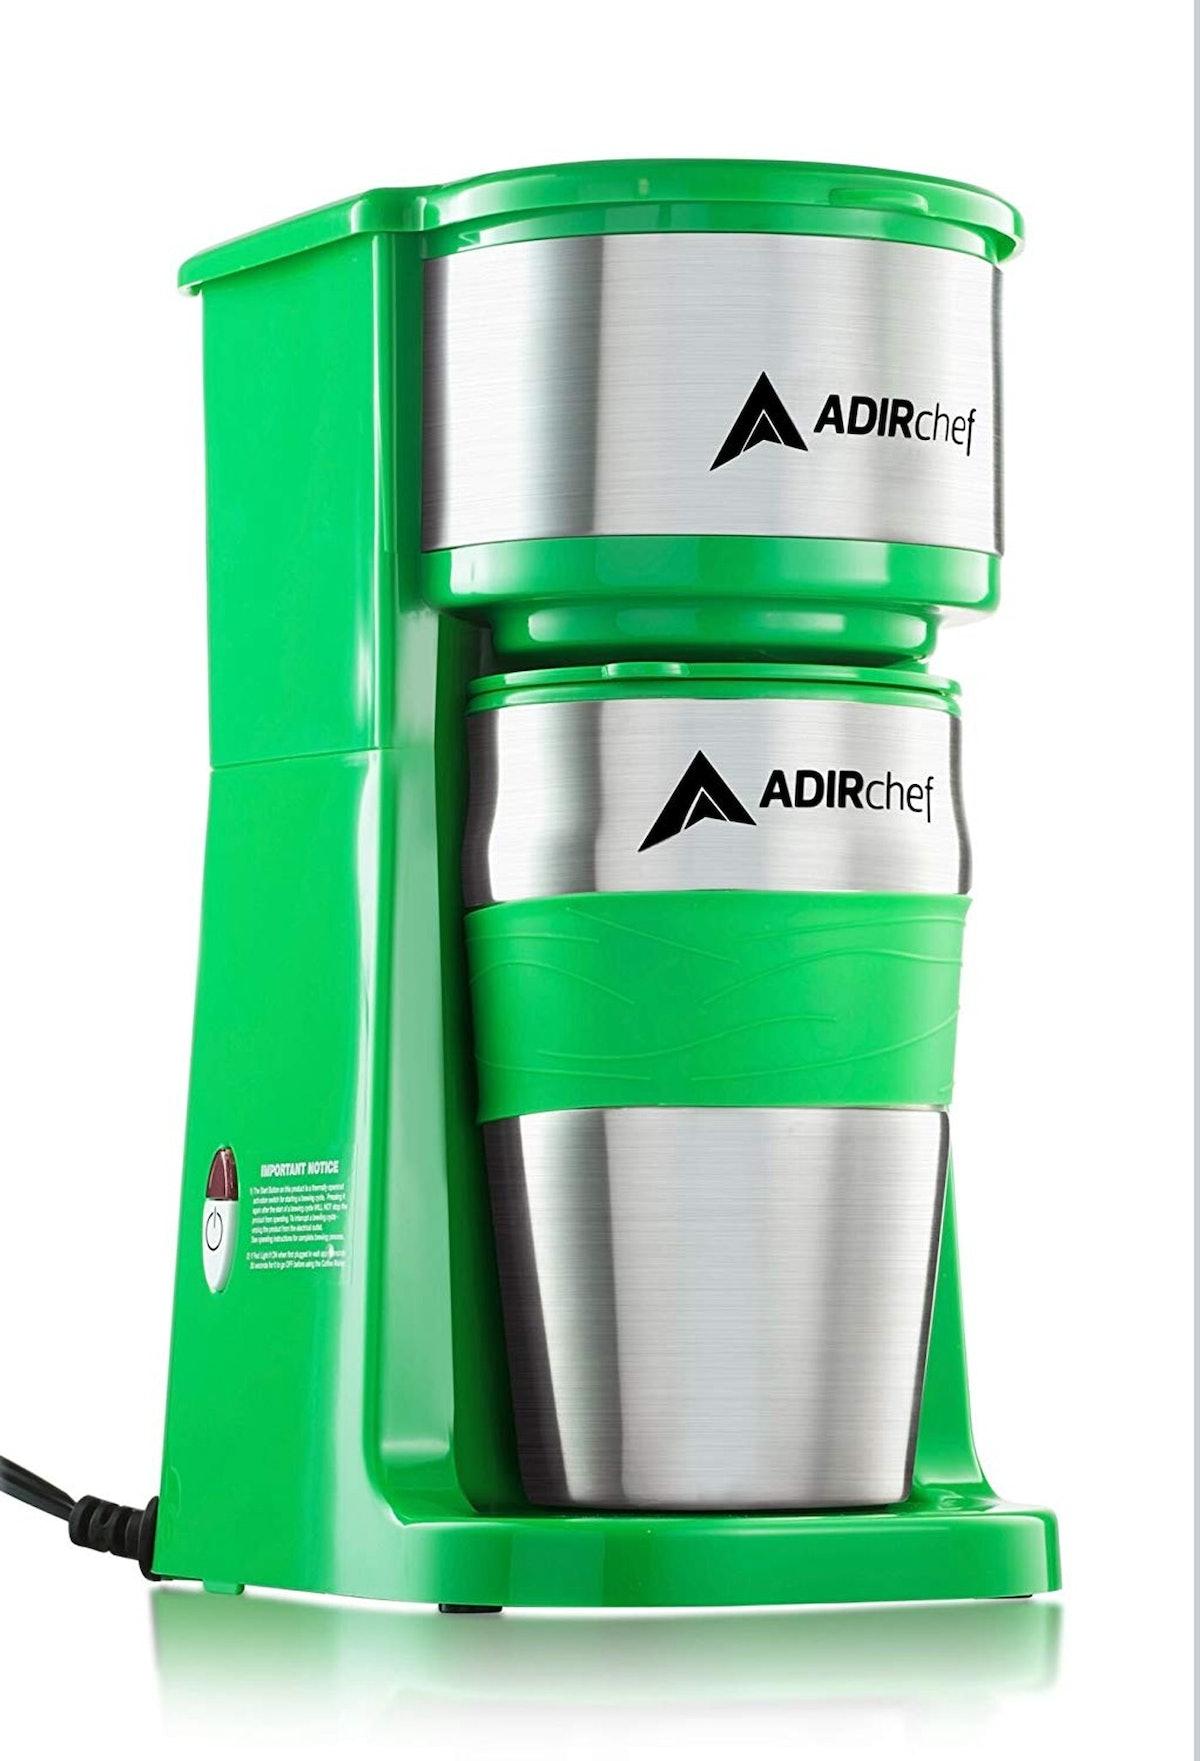 AdirChef Personal Coffee Maker